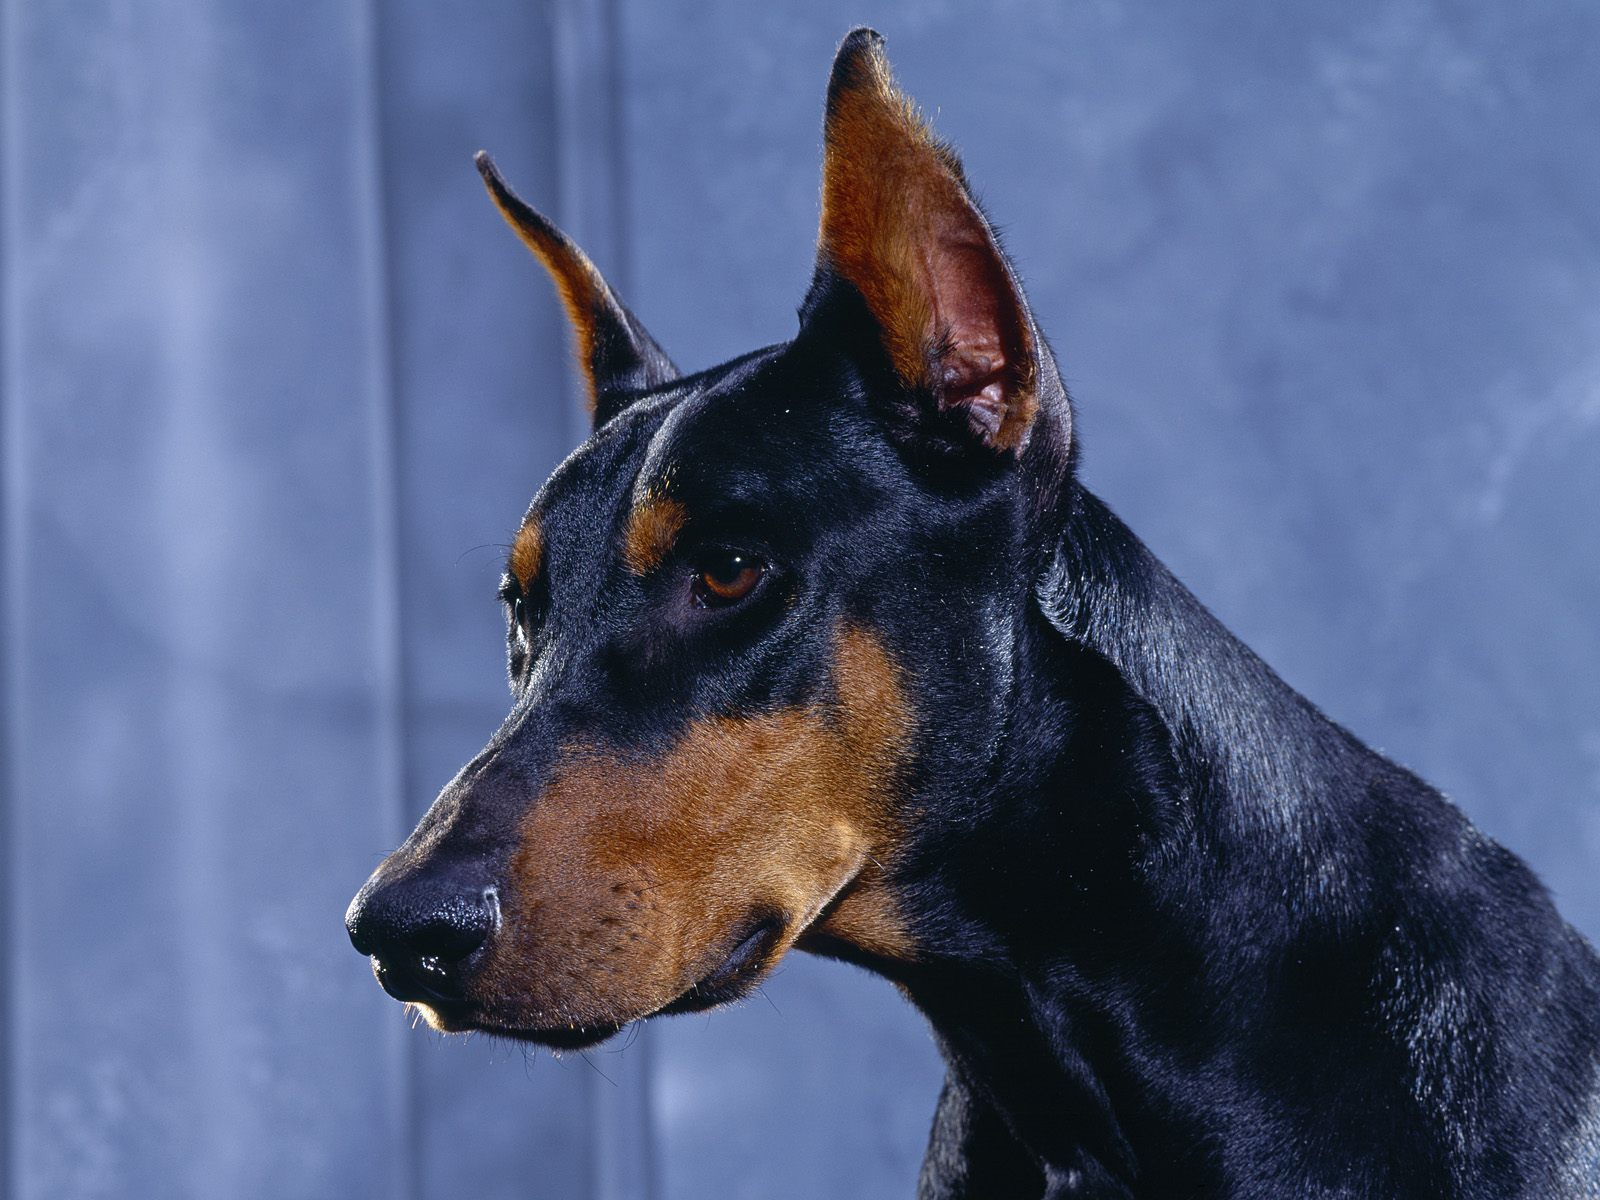 http://1.bp.blogspot.com/-QYC2PojgQsE/TmjyH6m7WdI/AAAAAAAABAk/fHFvrnnfCE8/s1600/Doberman-Shepherd-Dog-Wallpapers-www.stillmaza.com-4.jpg